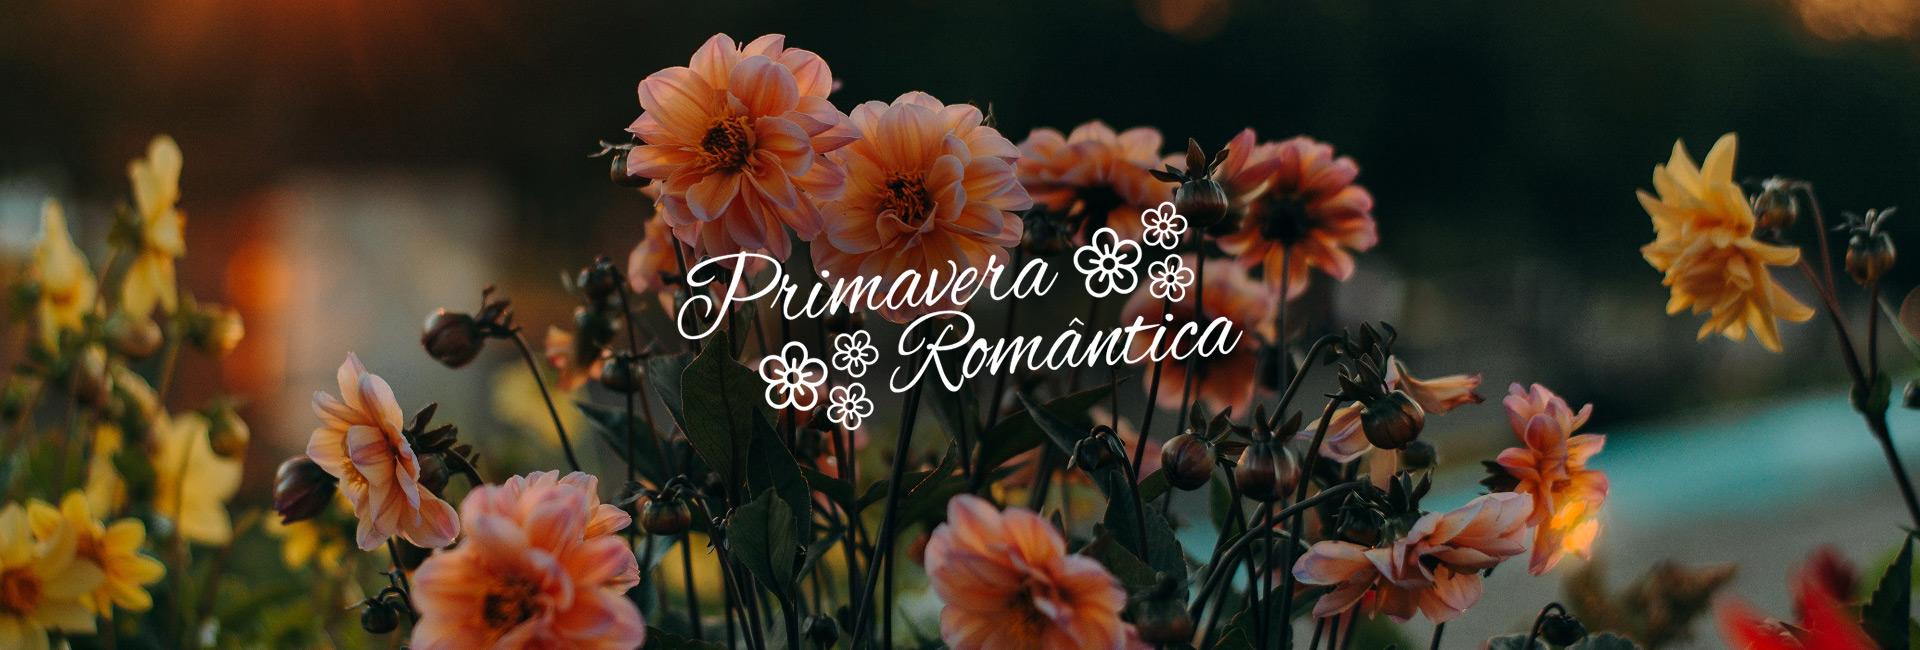 nascentes-primavera-romantica